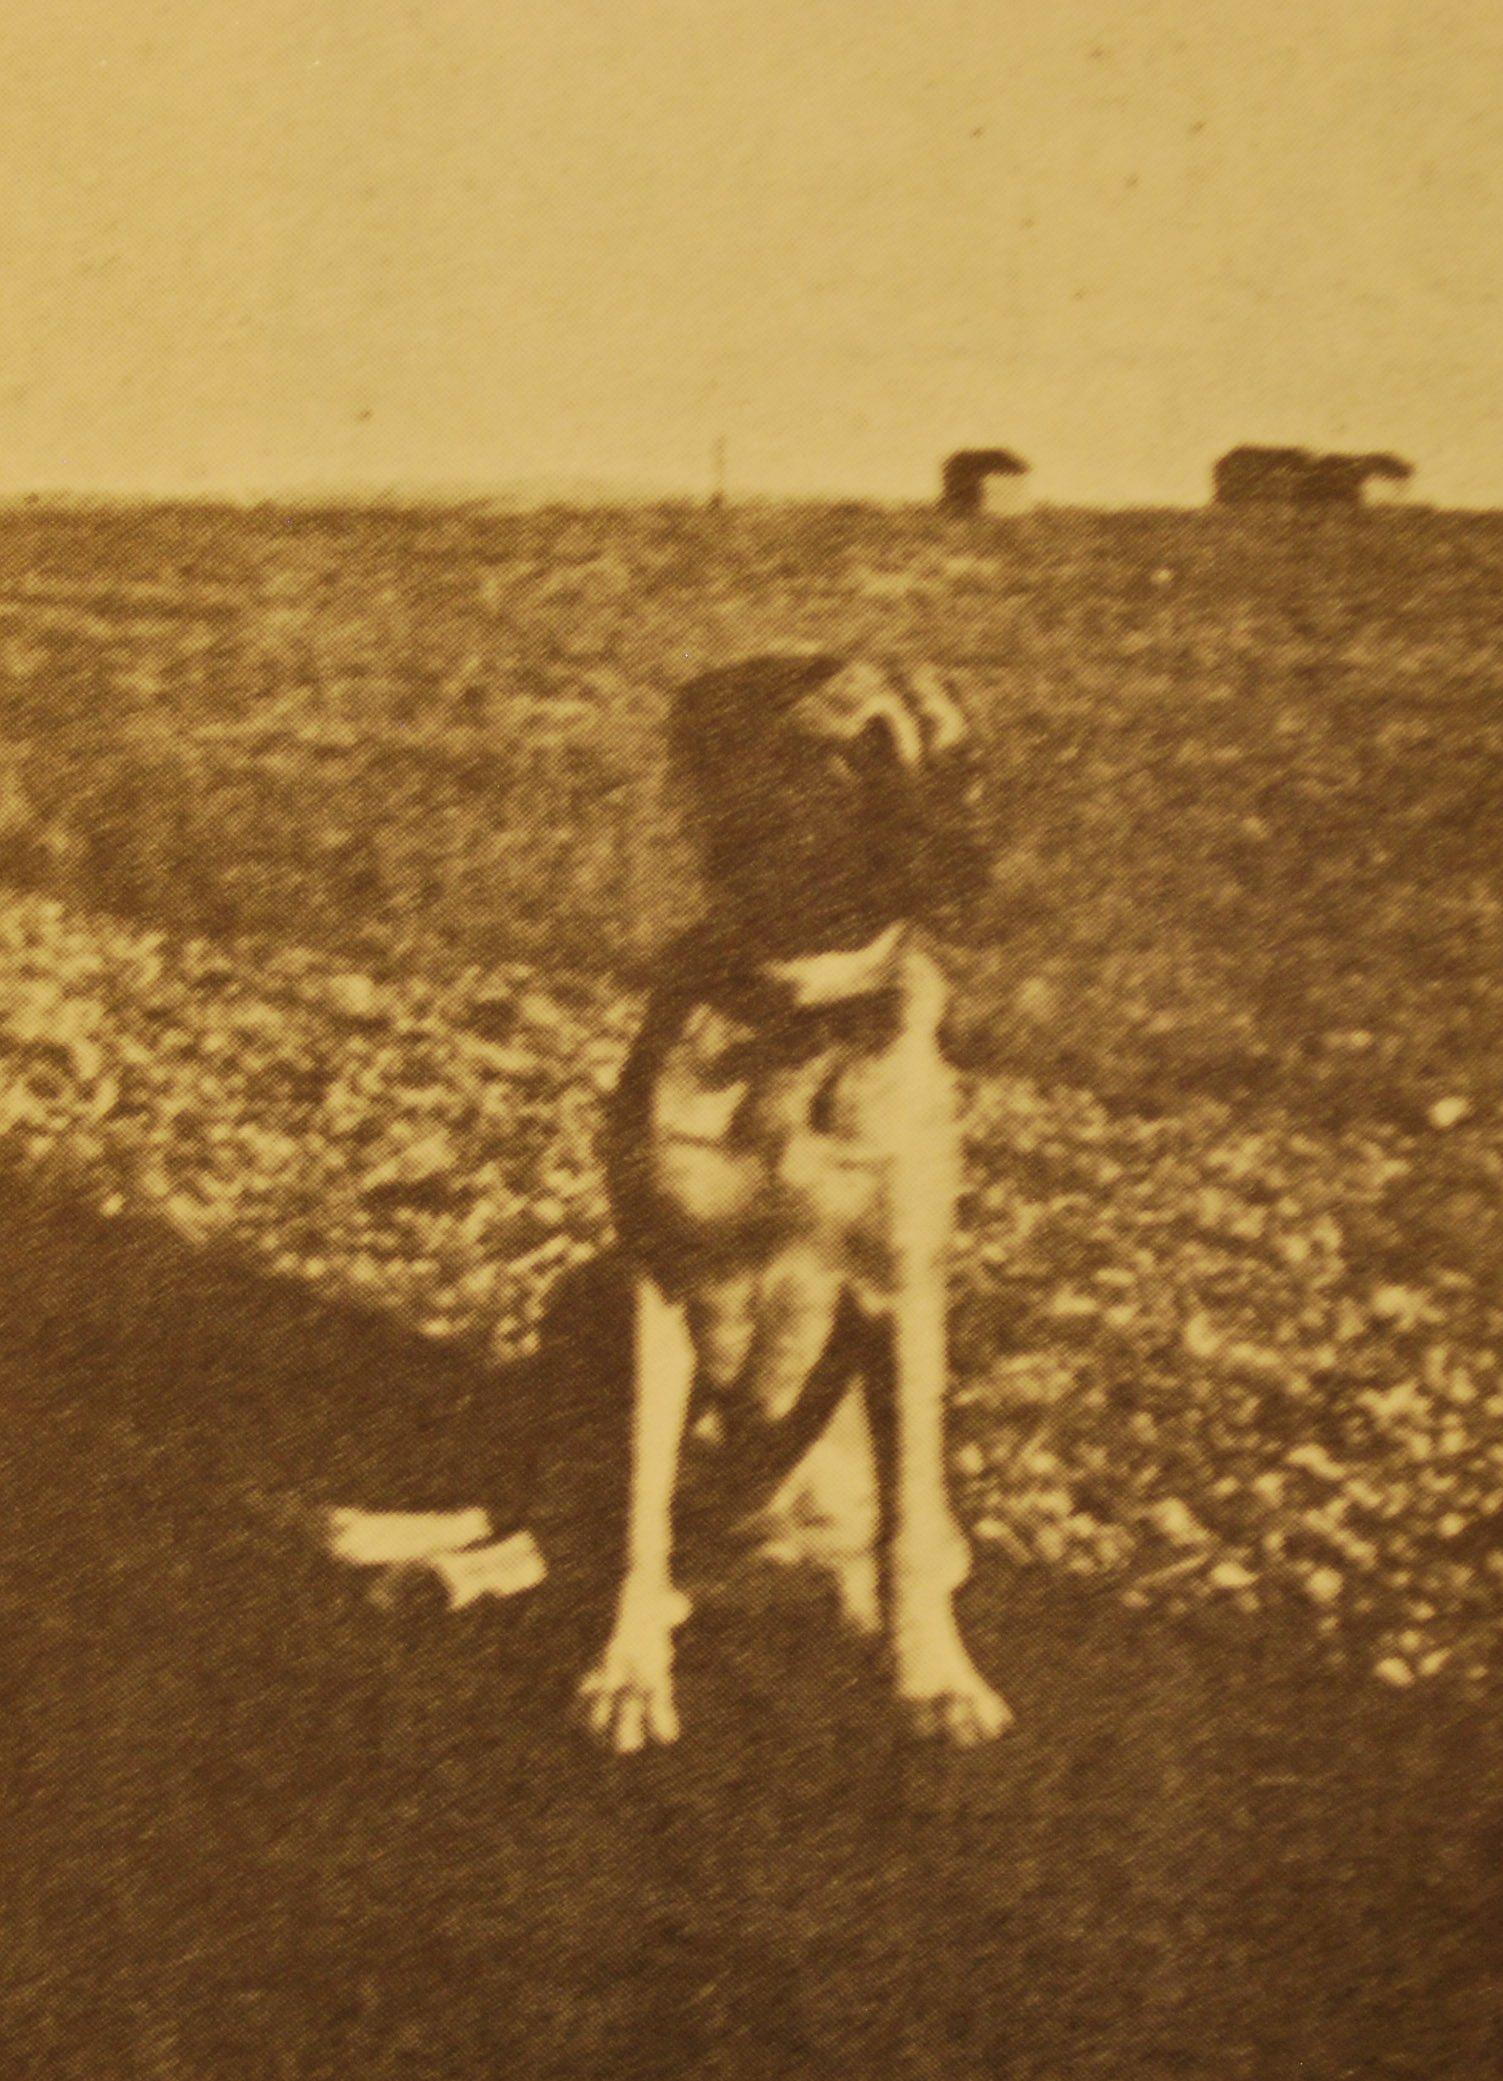 Count Vivian Hollander's Bull-Mastiff pup, Nada the Fearless.